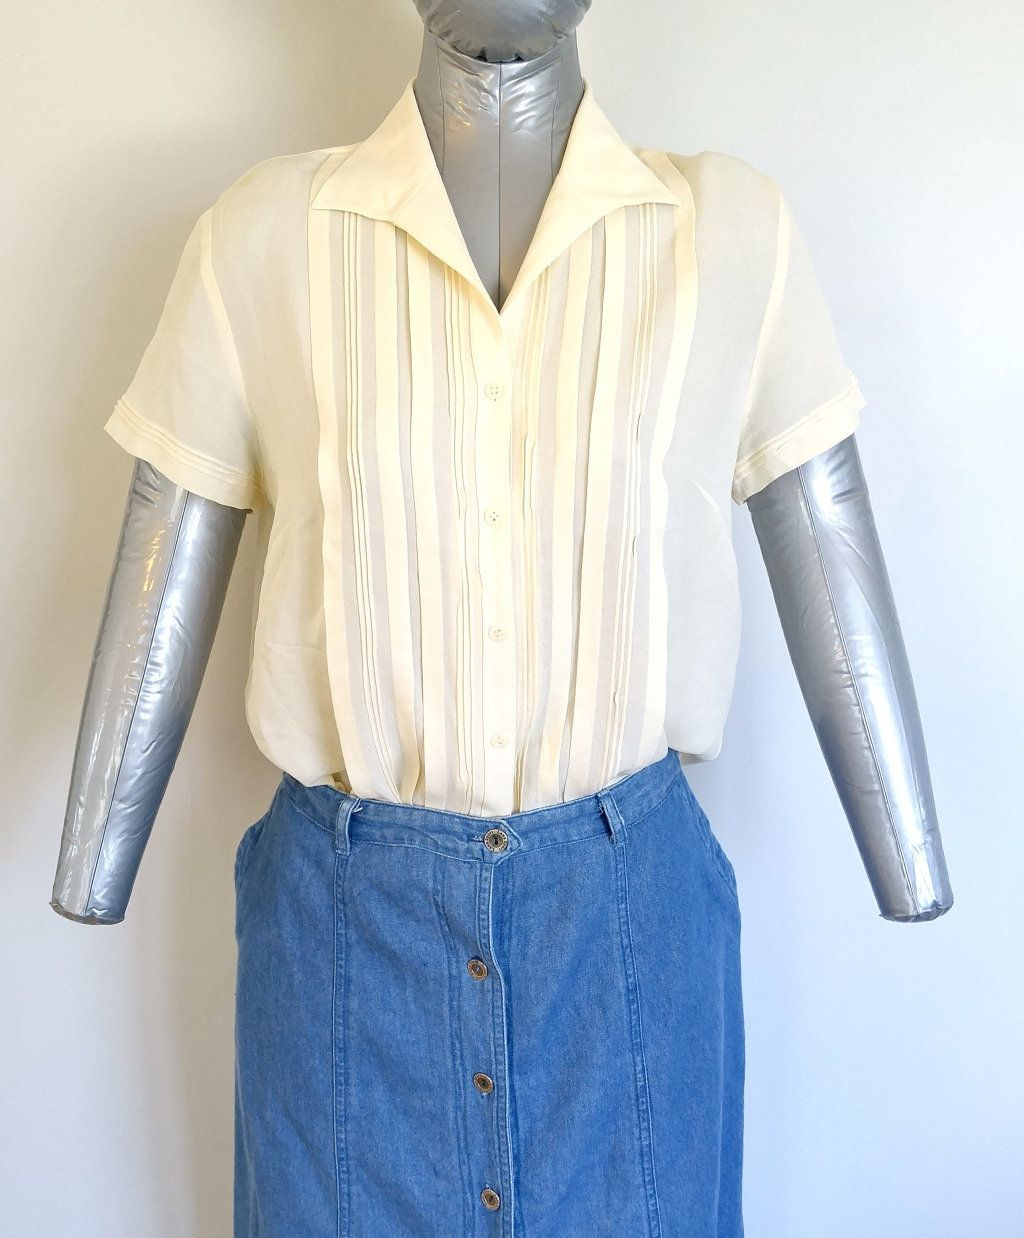 22412b6e Vintage Jones New York, Women's Pastel Yellow Pleated Button Down Blouse,  Size 12P,